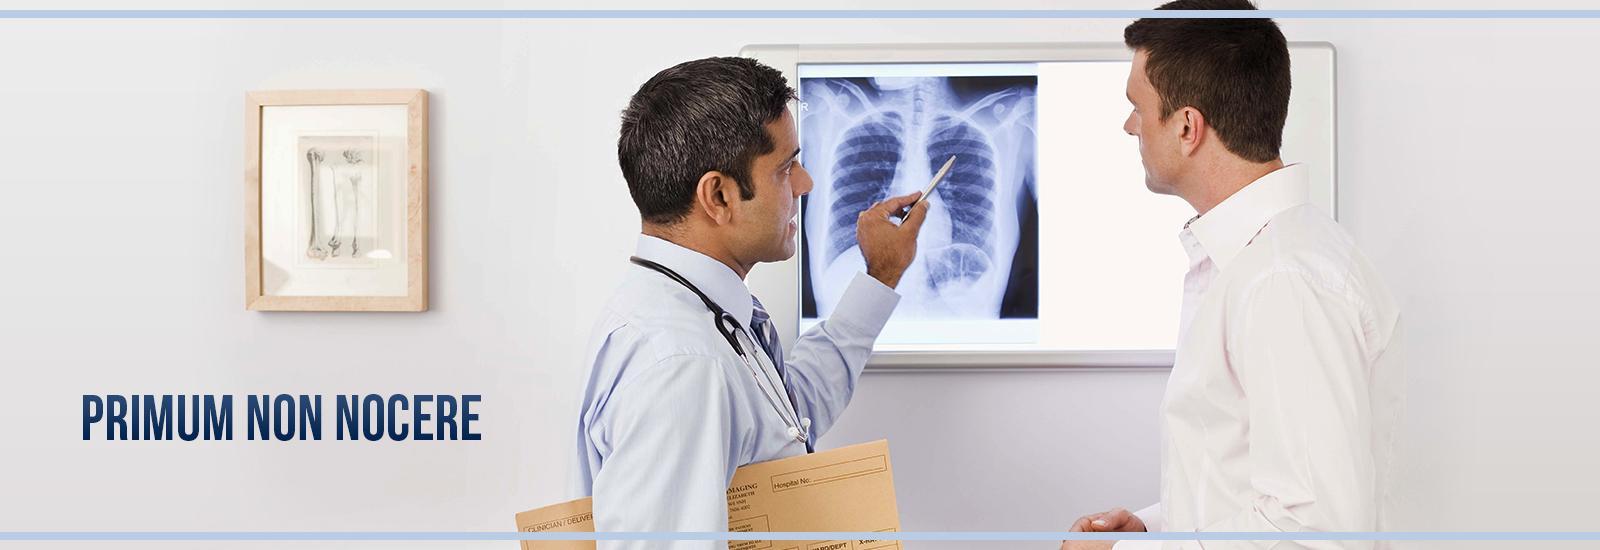 Dr. Ricardo J. Zambrano - Traumatología y Ortopedia